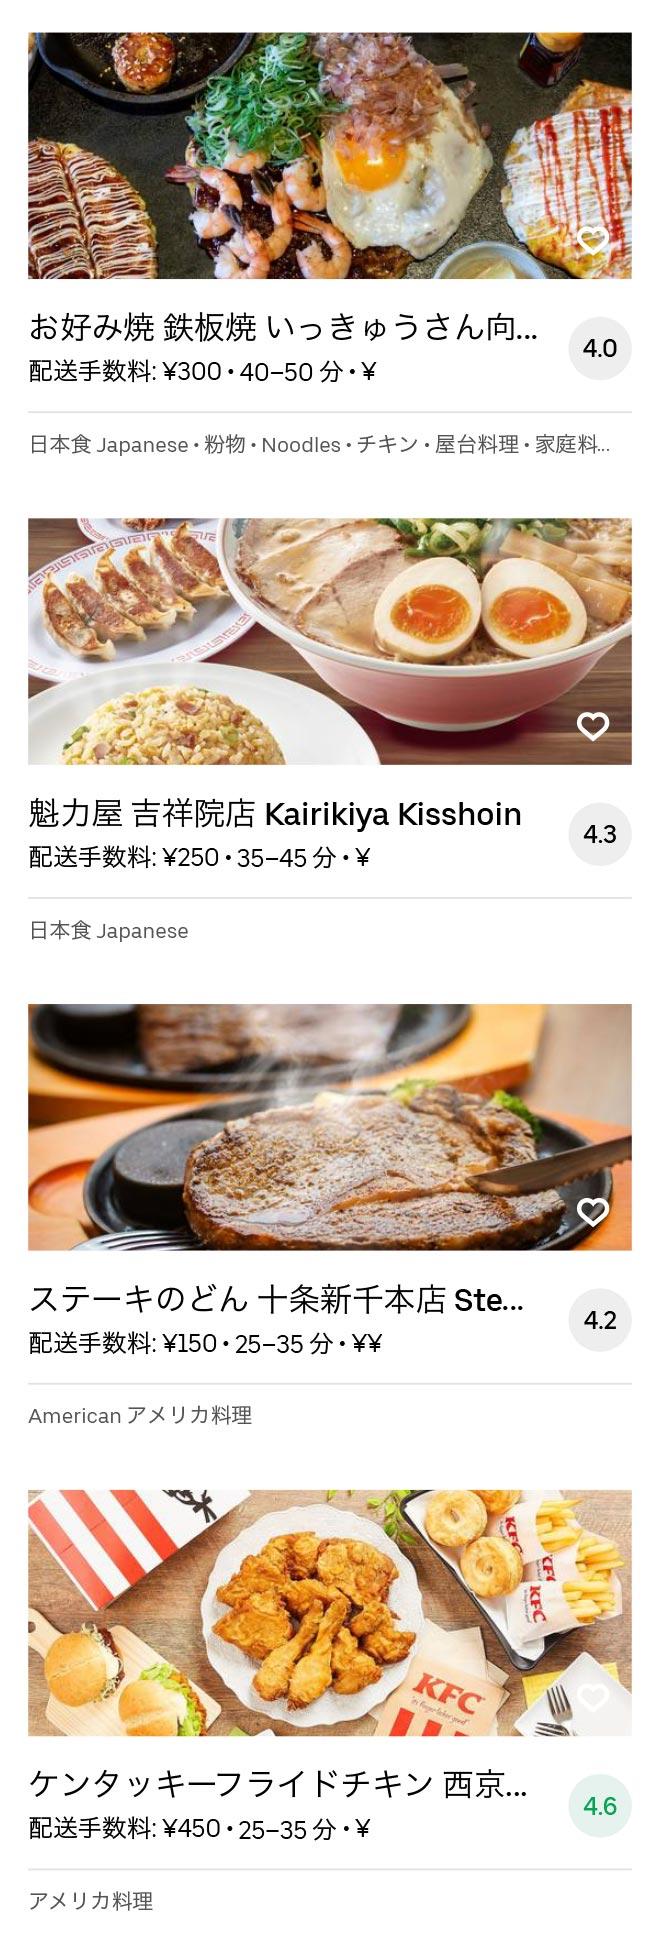 Mukoumachi menu 2008 09